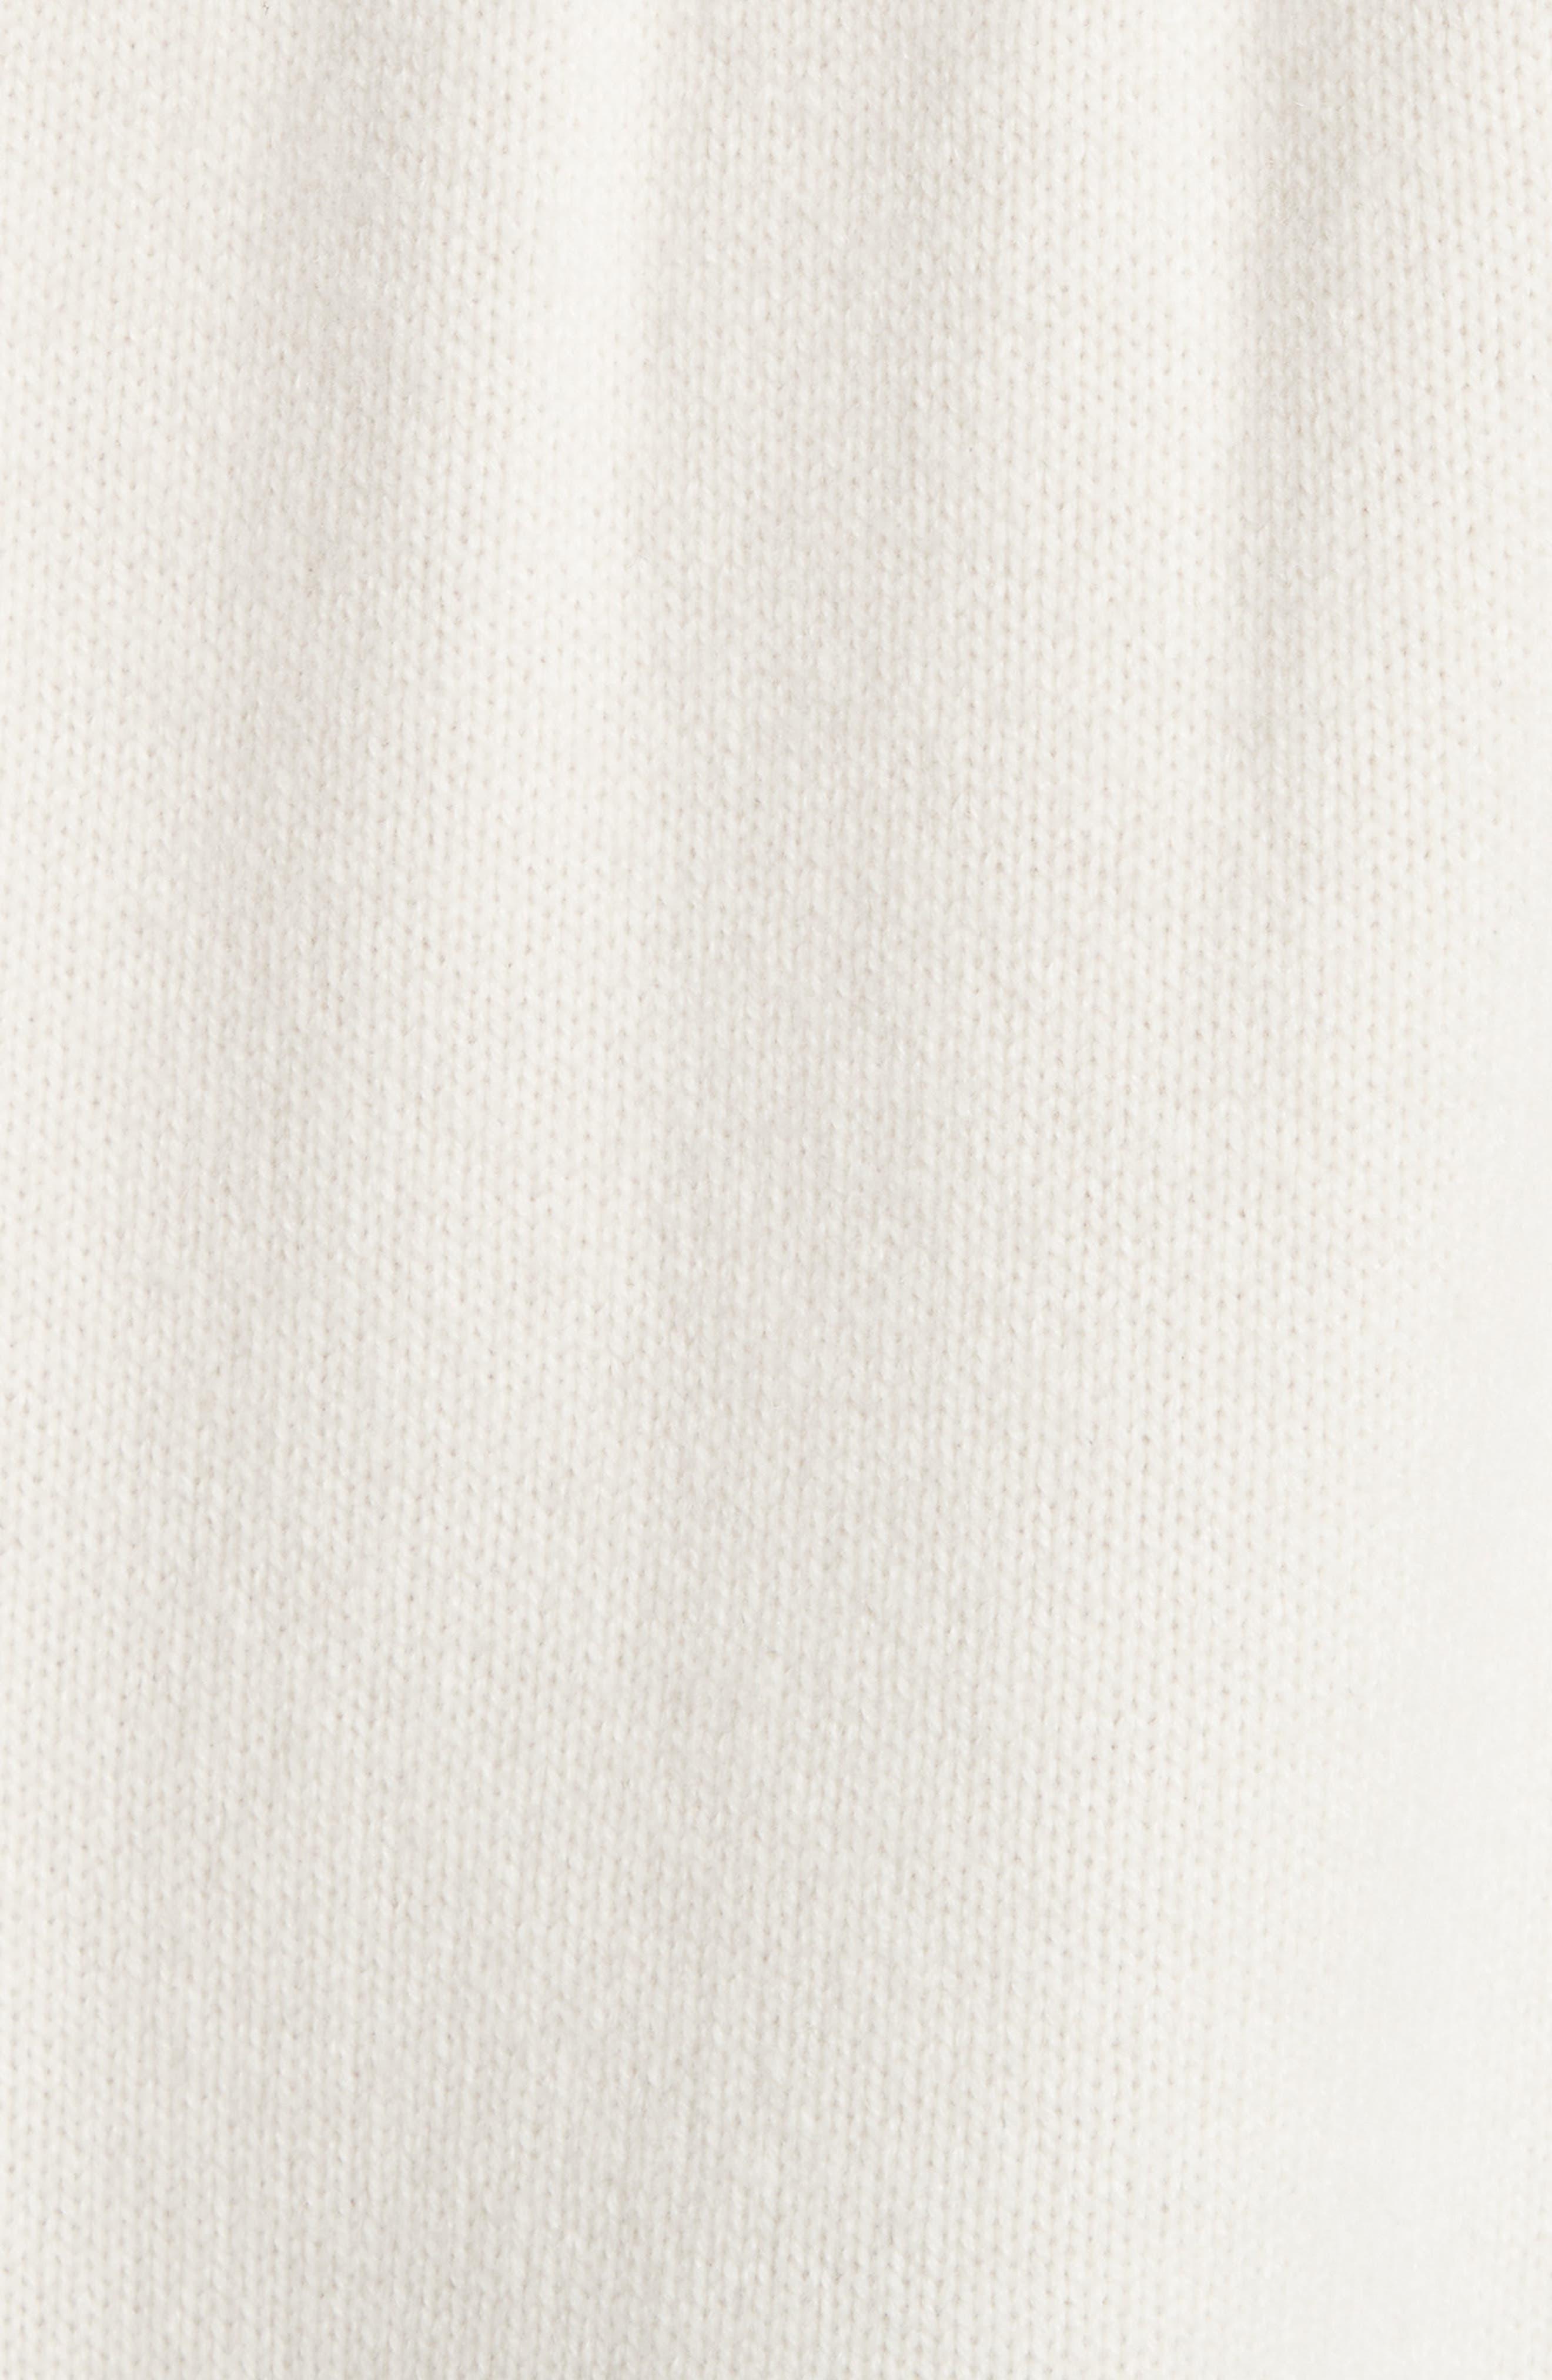 Rib Knit Cashmere Tunic Sweater,                             Alternate thumbnail 3, color,                             Ivory